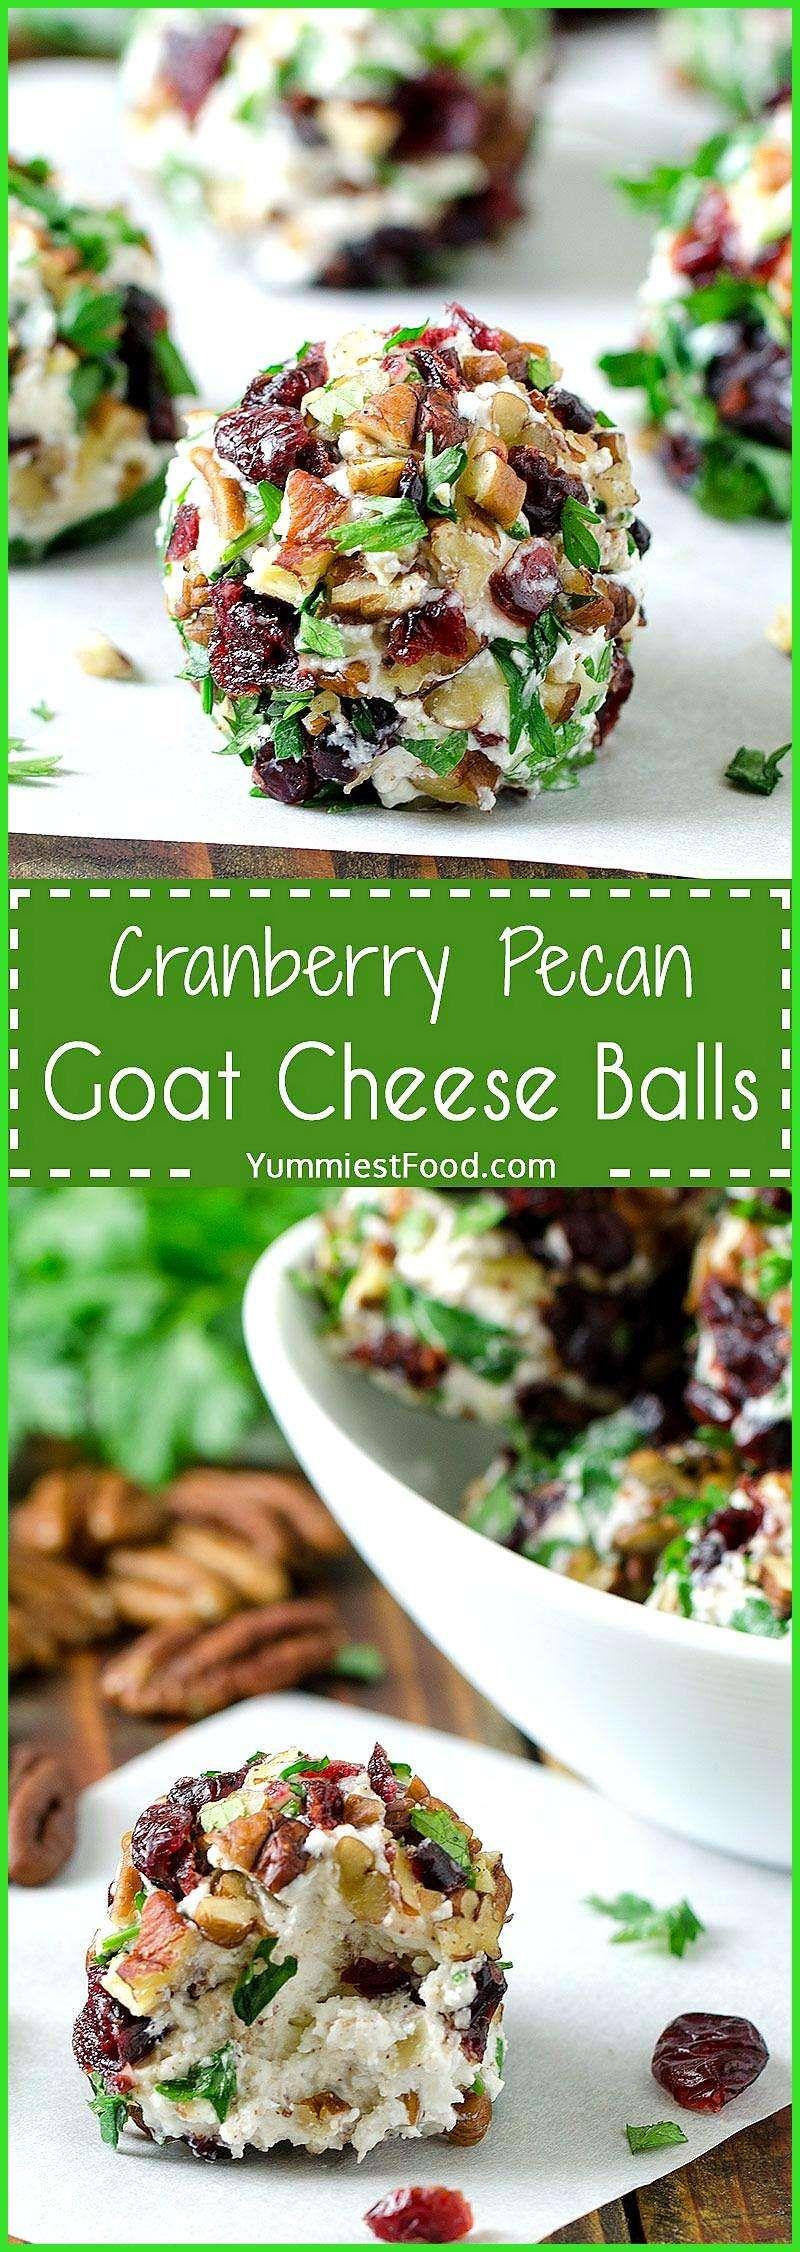 Cranberry Pecan Goat Cheese Balls CRANBERRY PECAN GOAT CHEESE BALLS  Quick easy and totally delicio